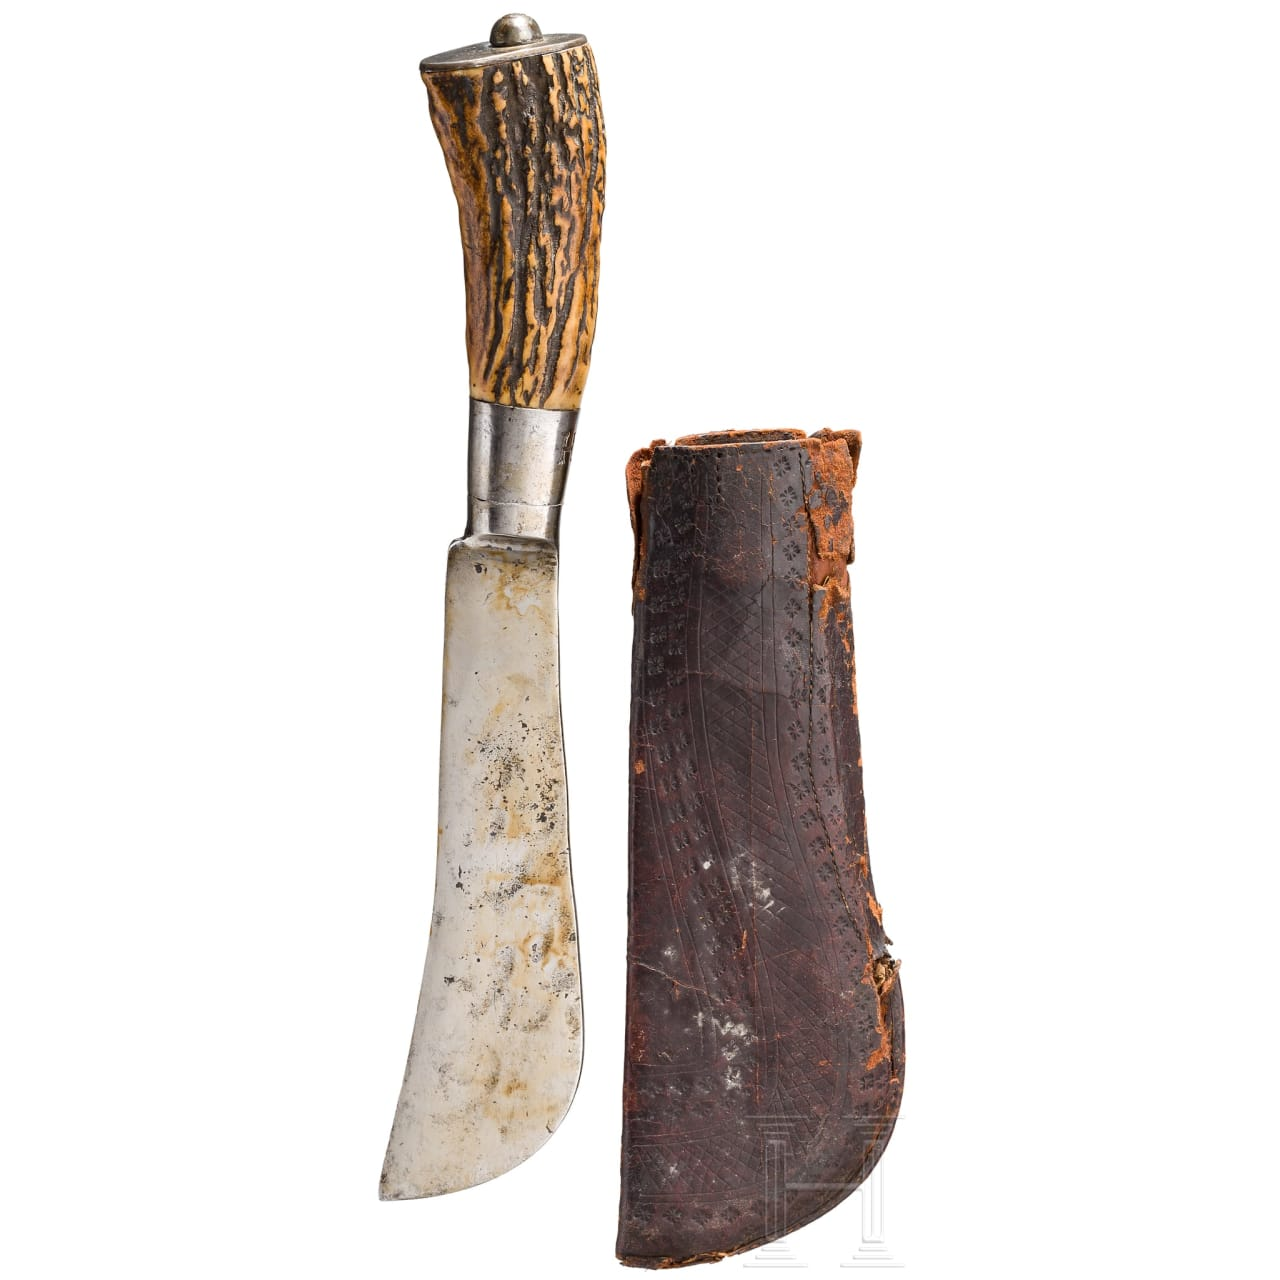 A German butcher's axe, 17th/18th century